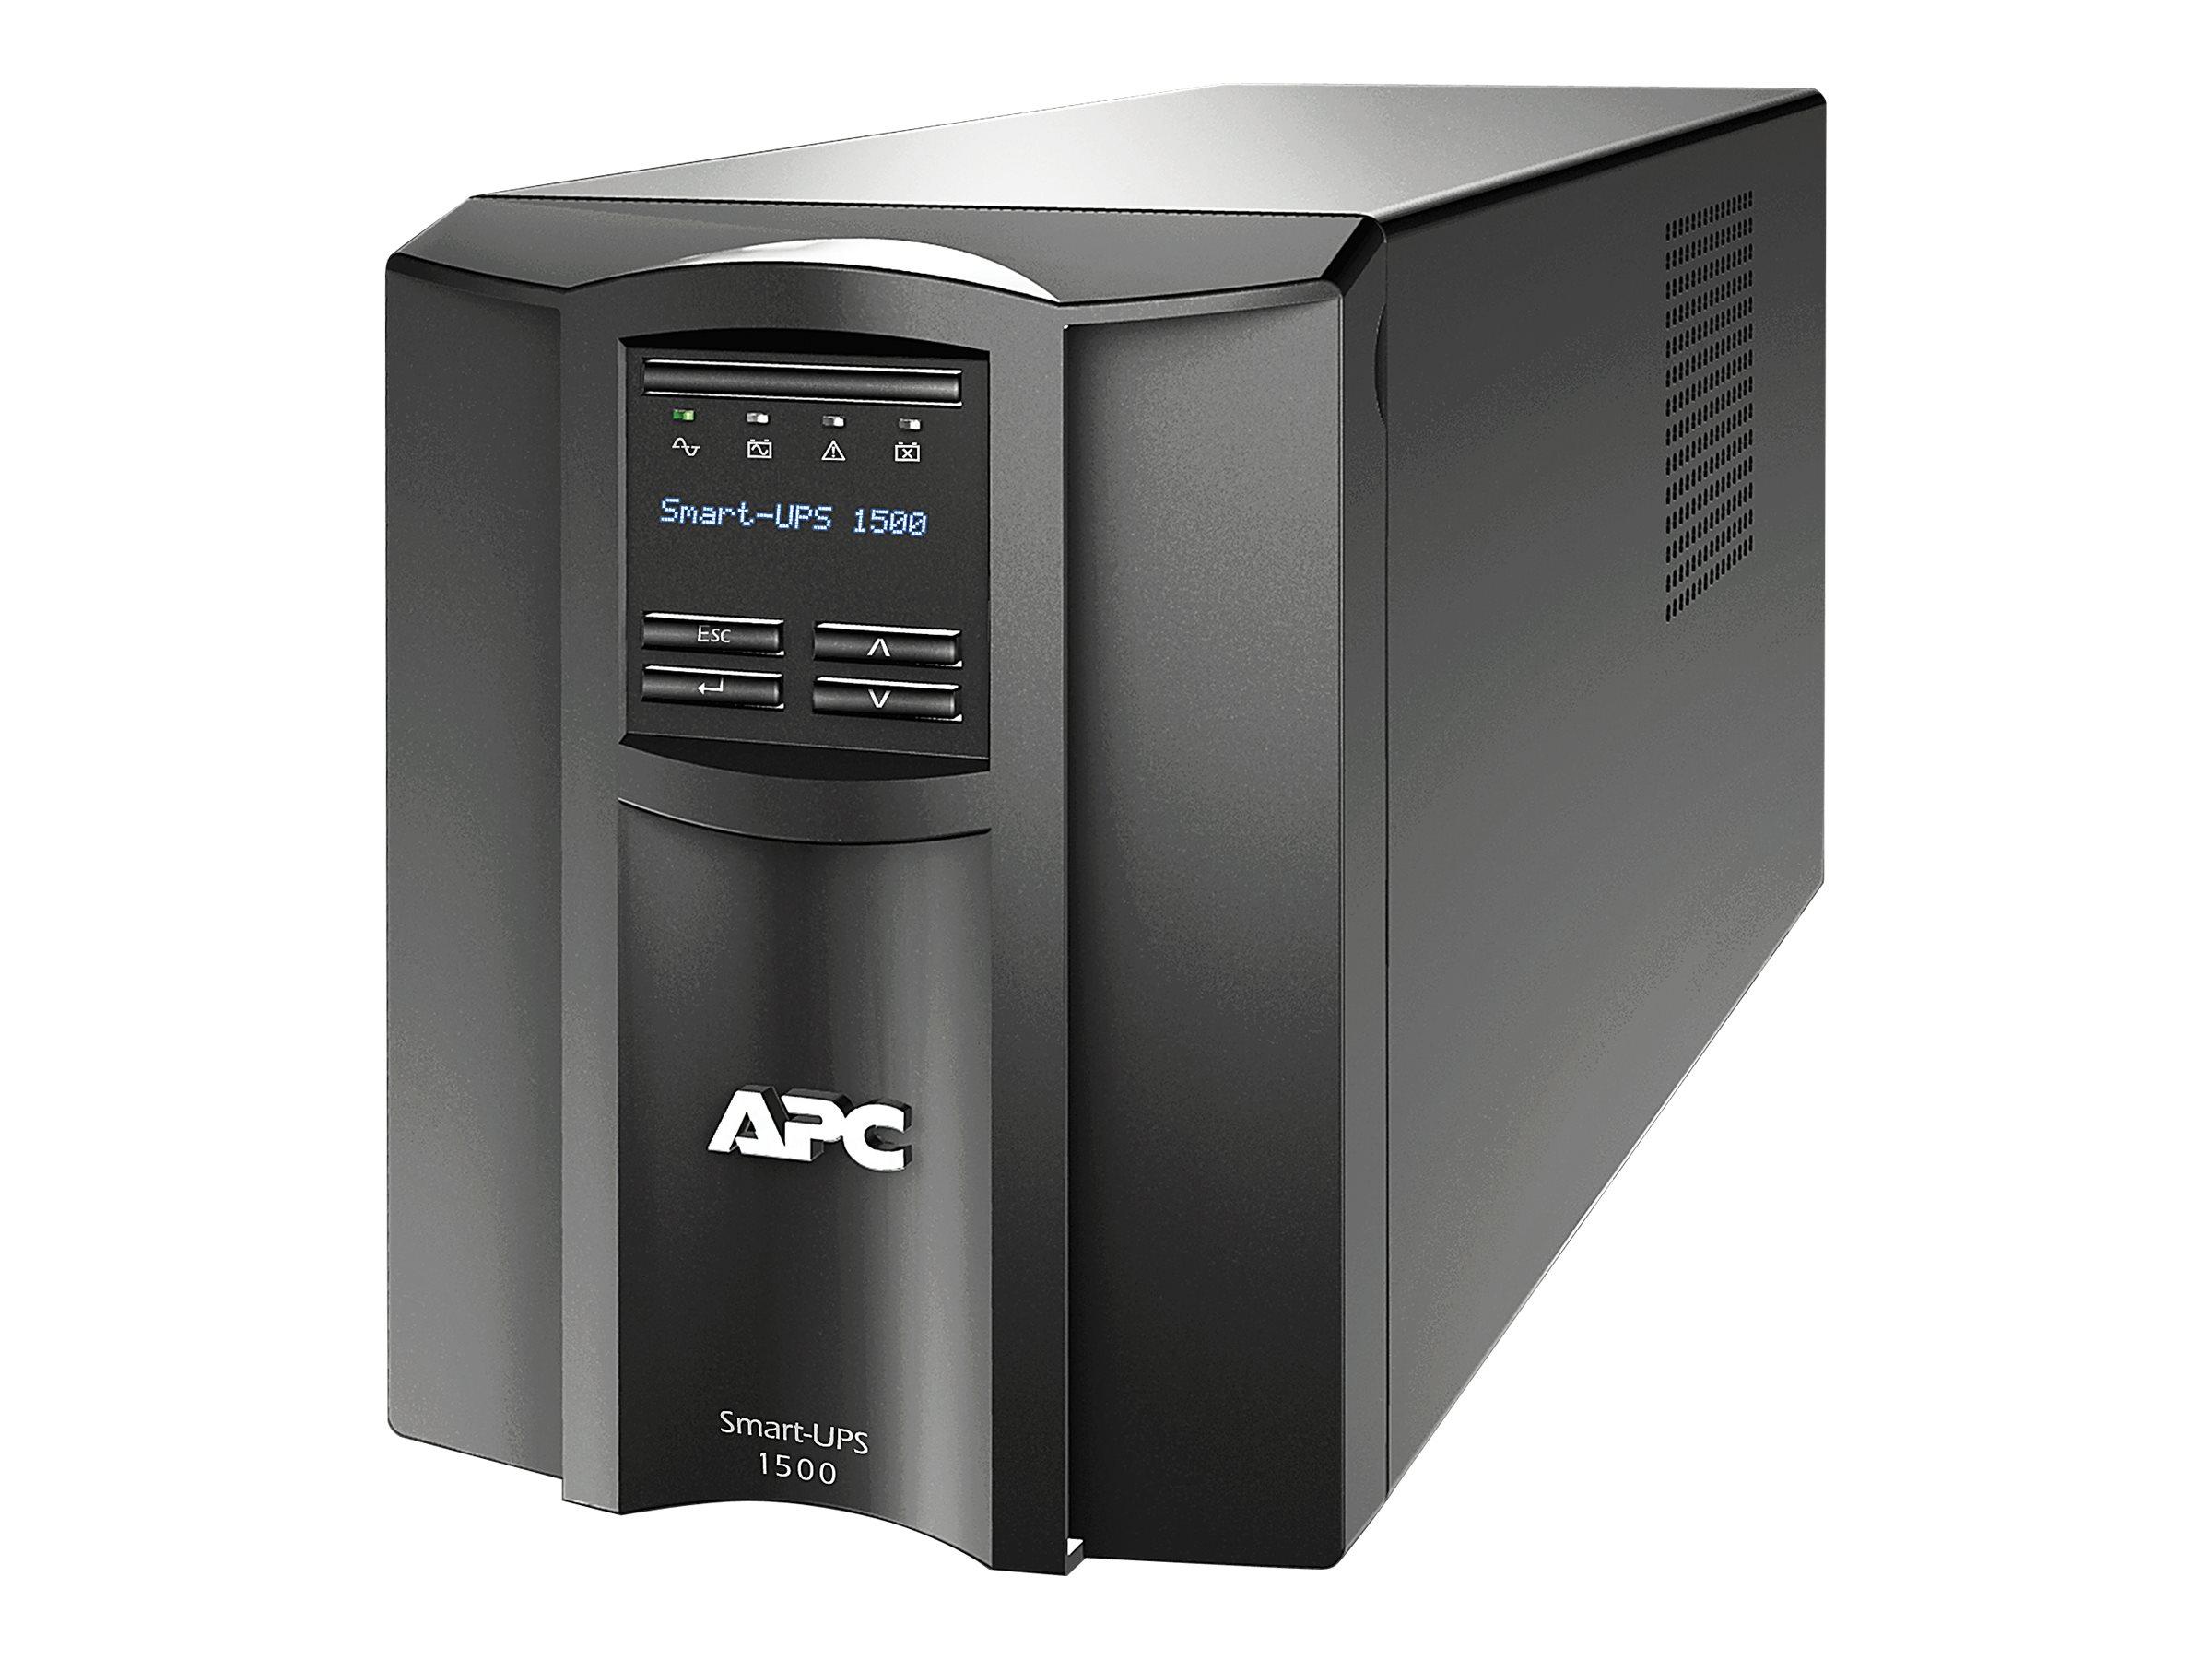 APC Smart-UPS SMT1500IC - USV - Wechselstrom 220/230/240 V